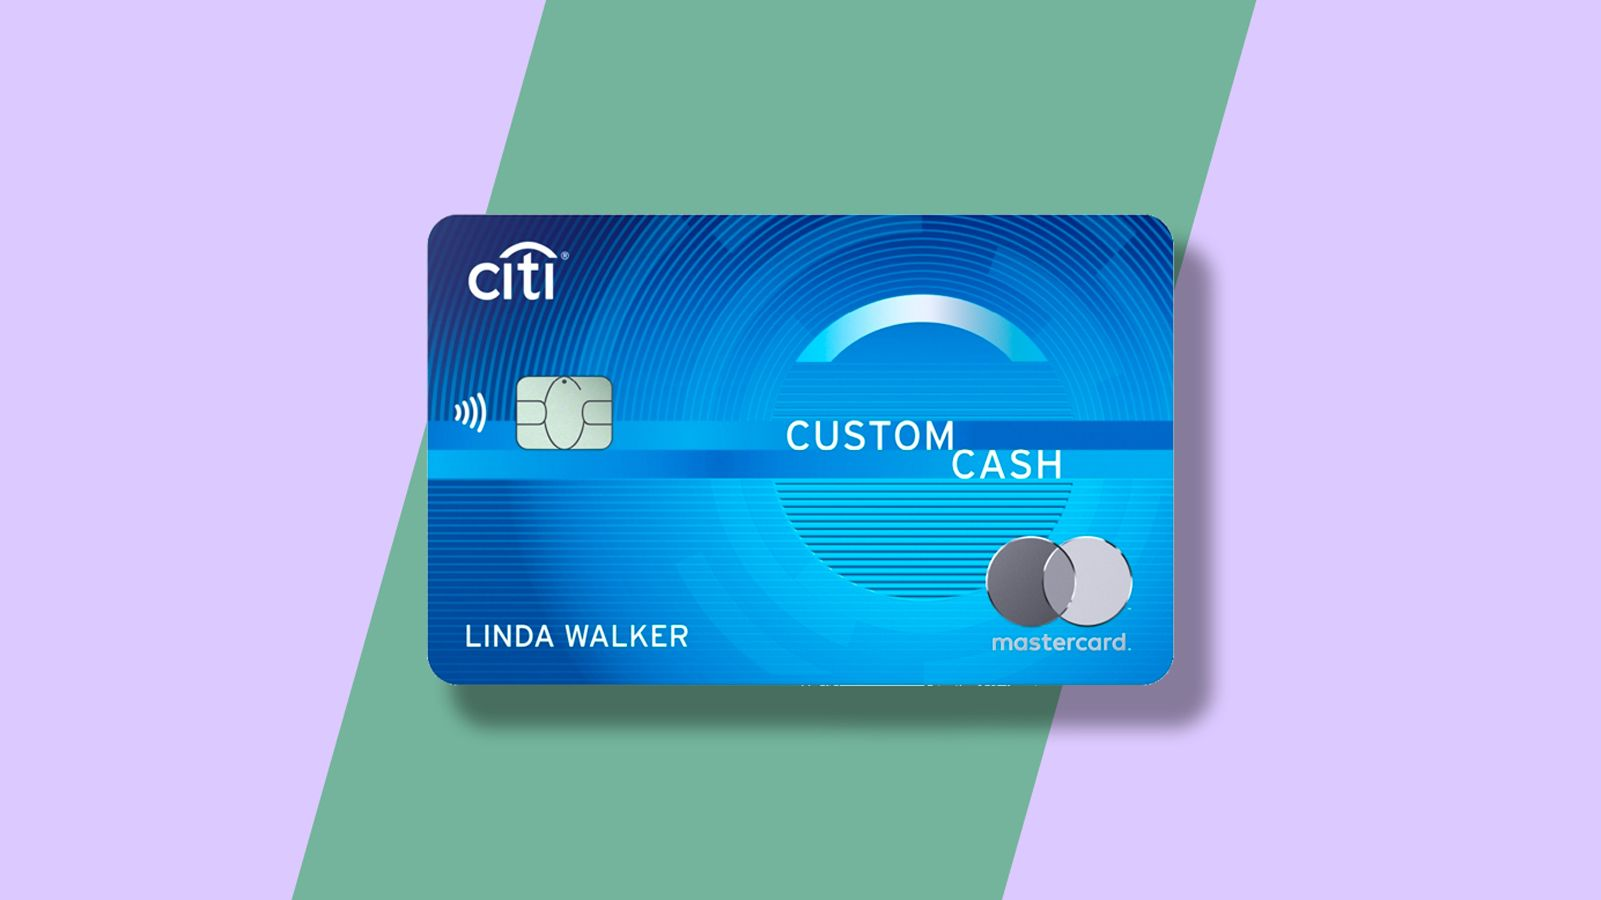 Citi launches new Citi Custom Cash Card: 8% cash back CNN